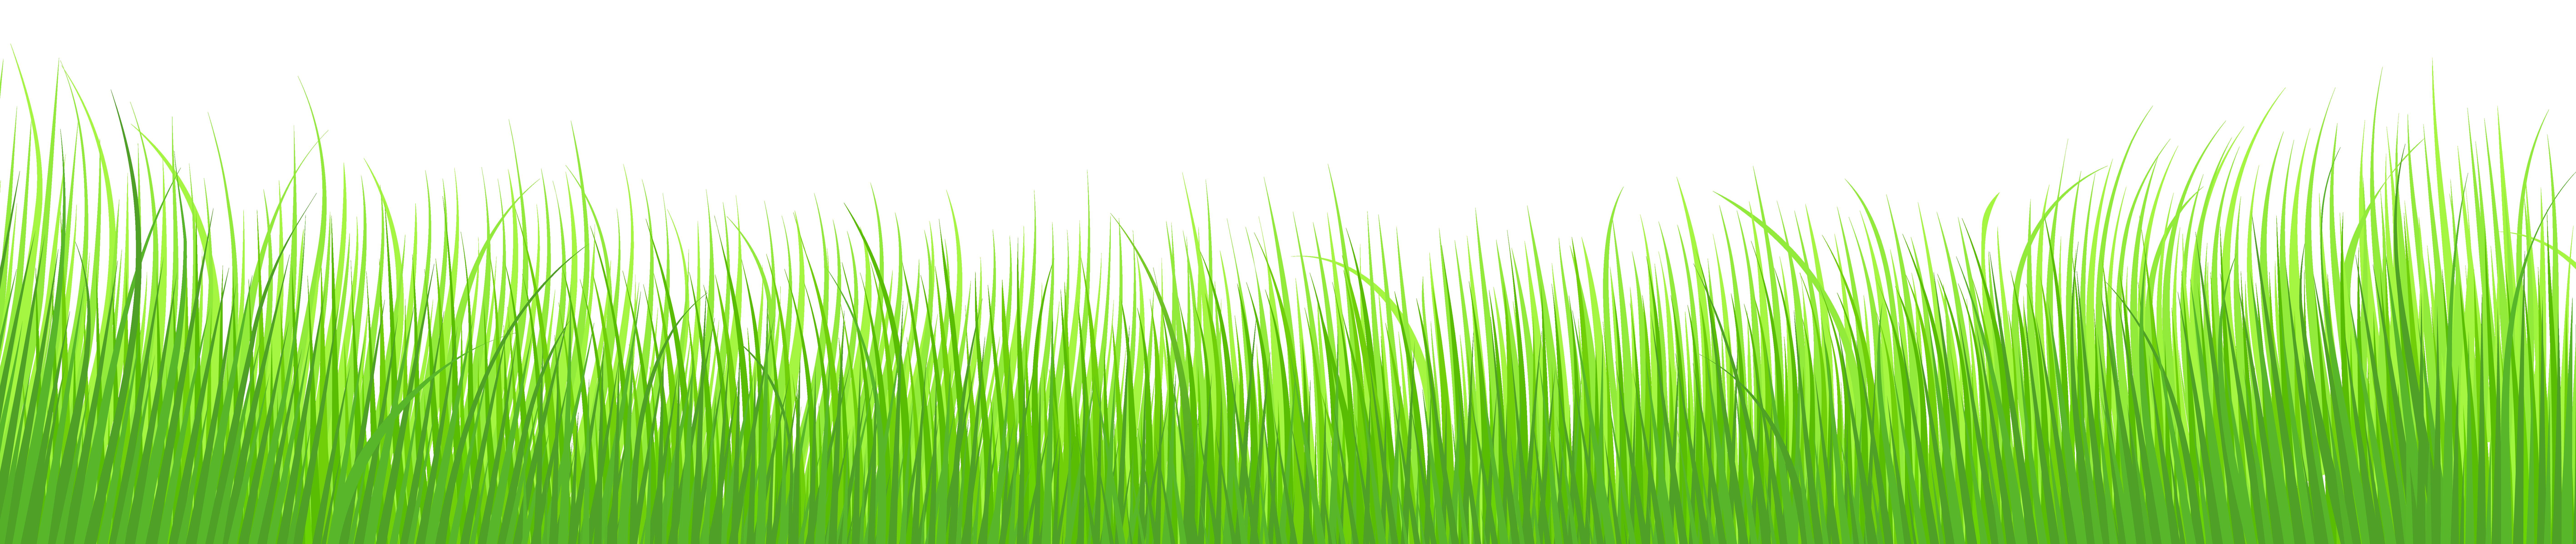 Grass clipart spring. Transparent png clip art